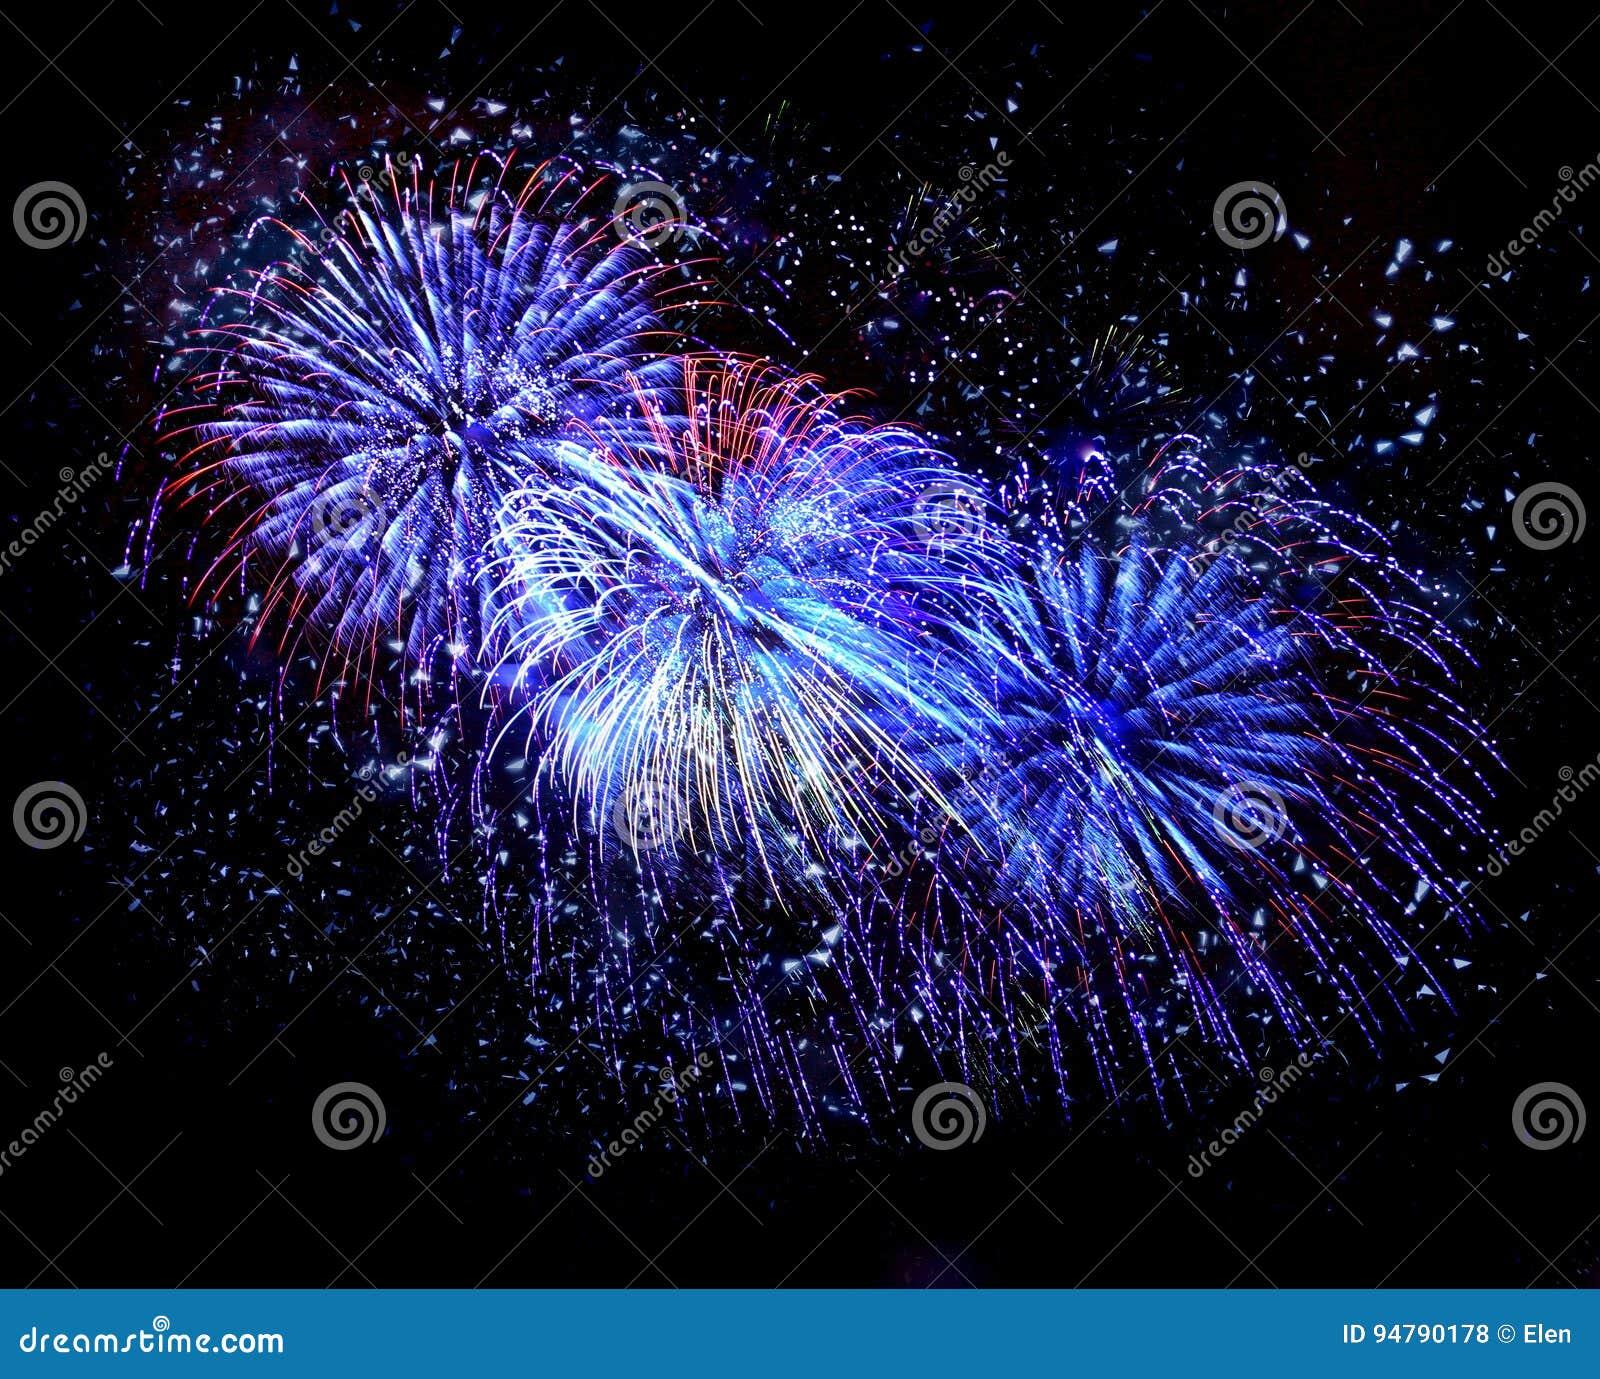 Beautiful blue fireworks in a night sky